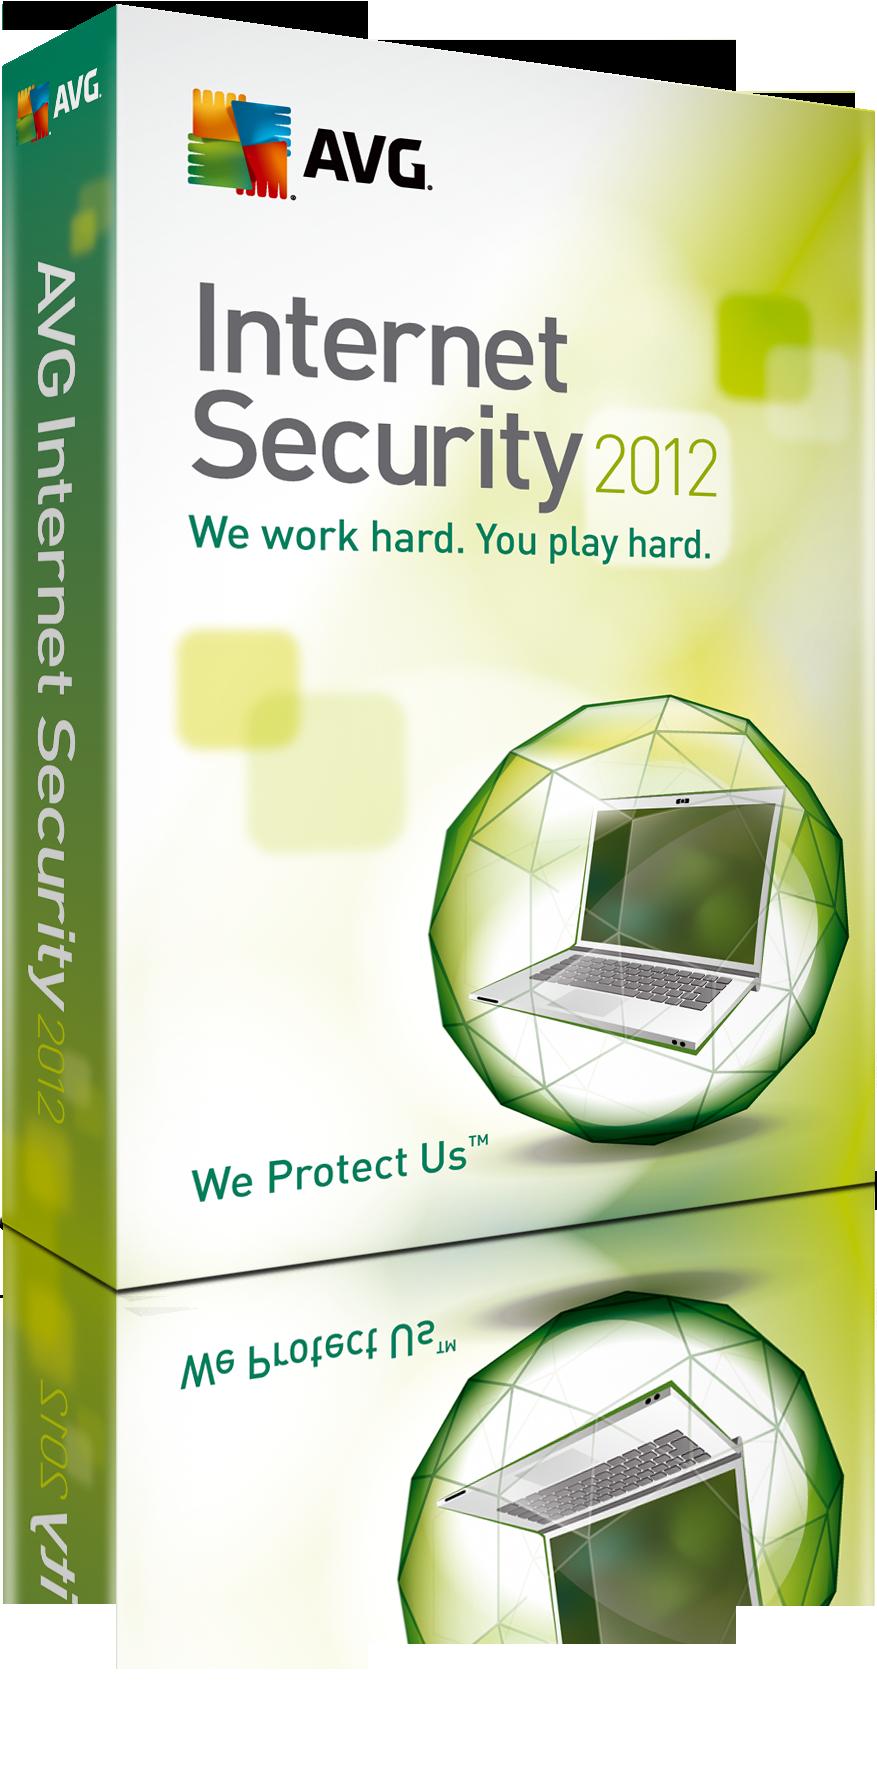 AVG: Internet Security 2012